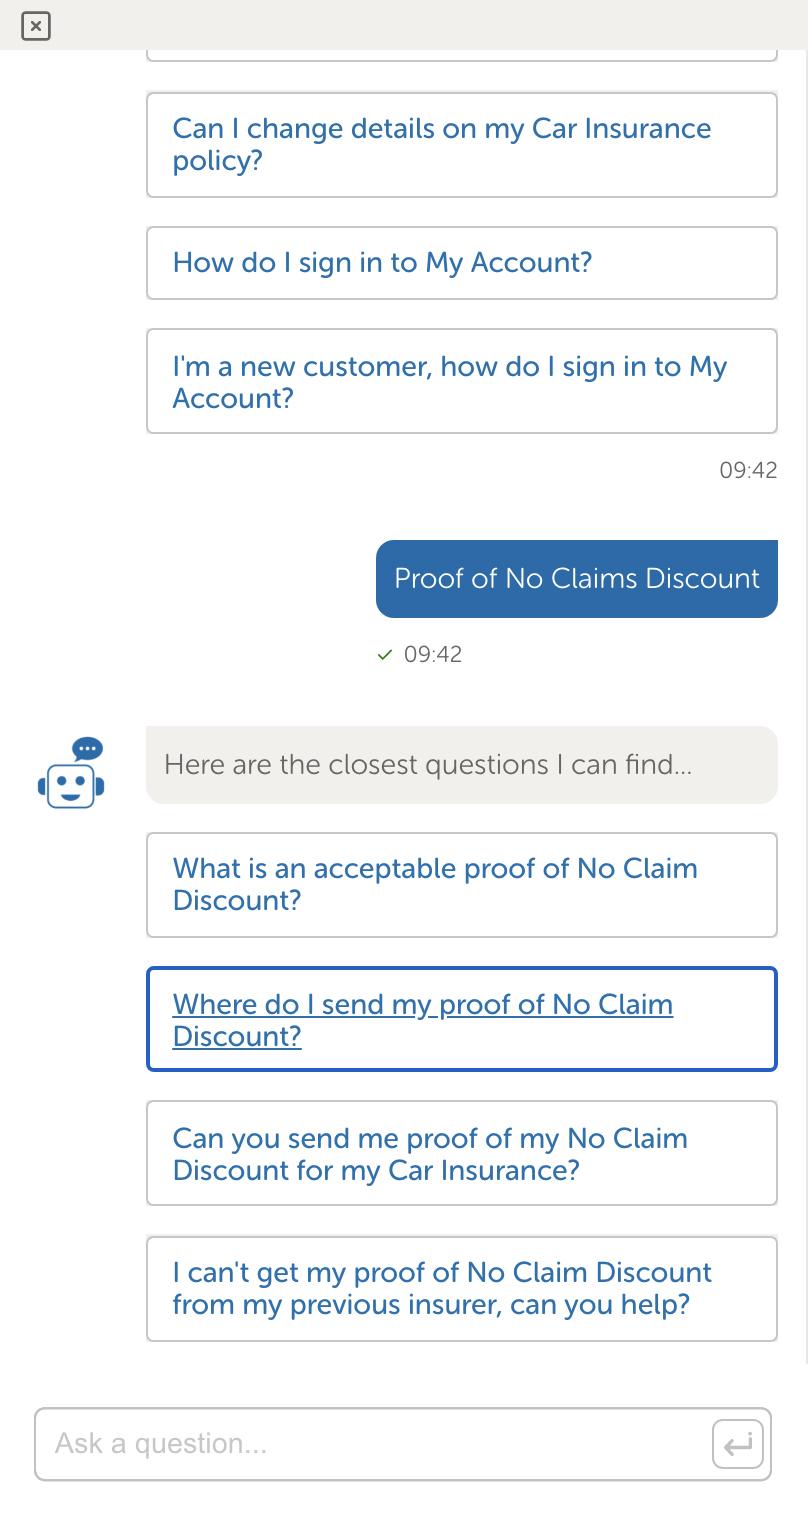 cb-customer-journey